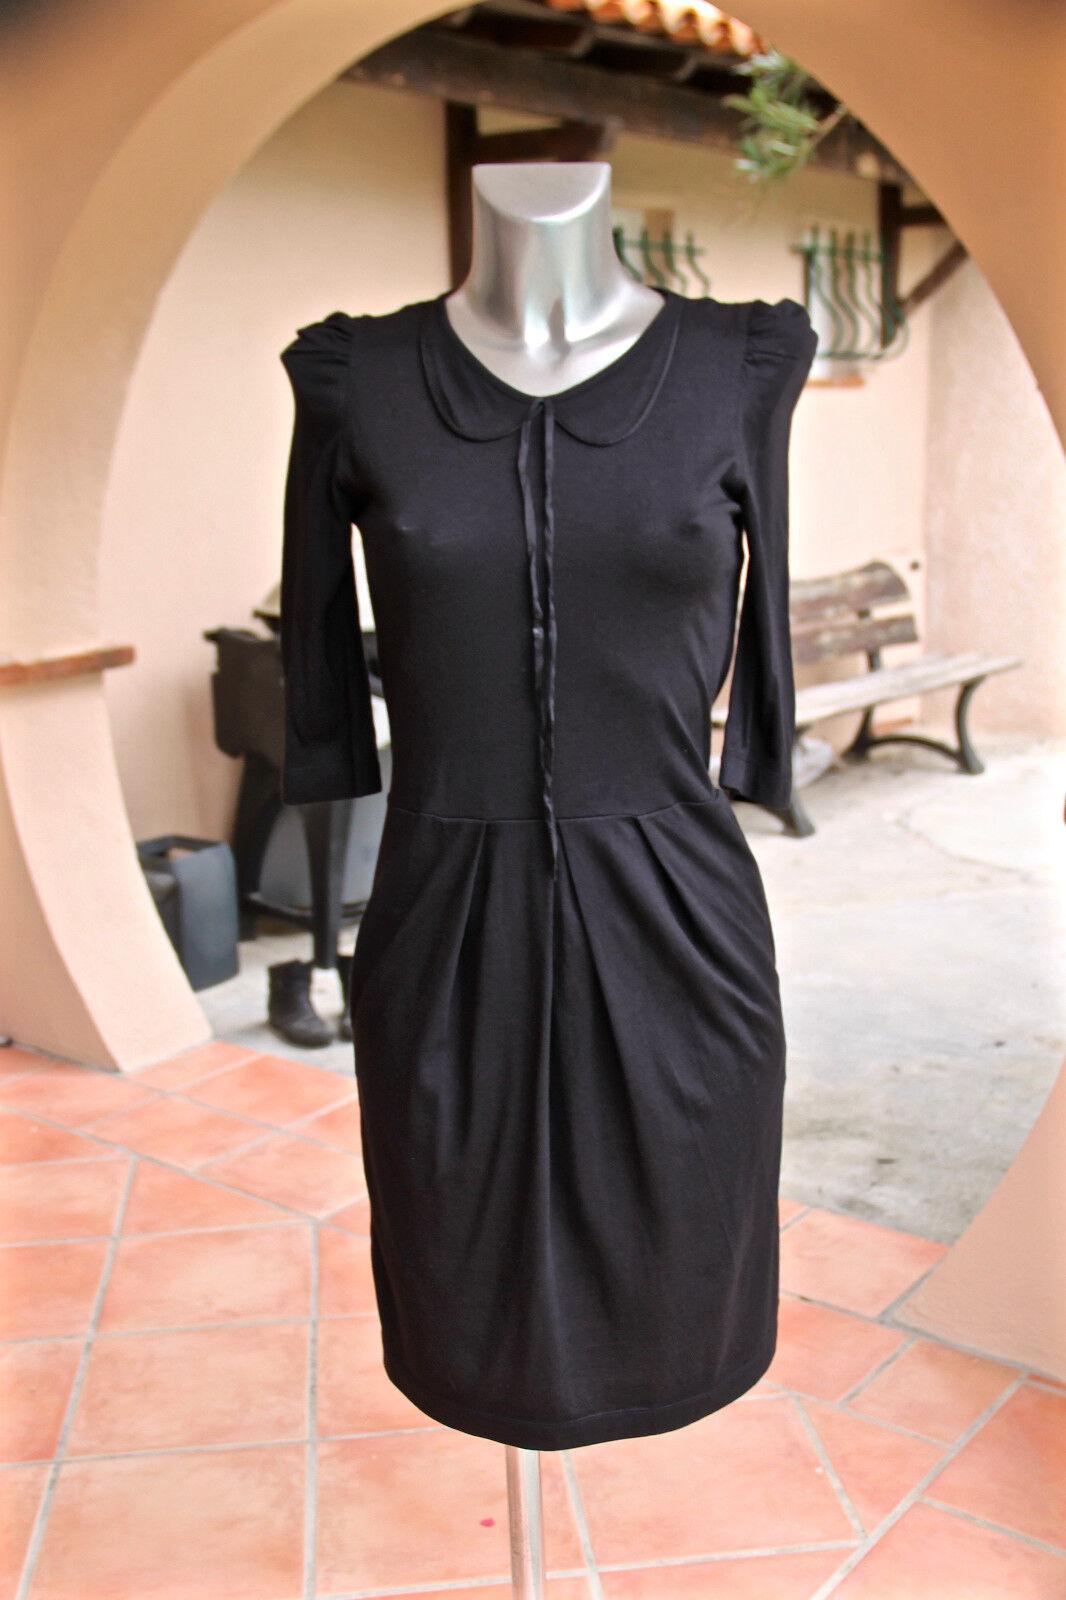 SANDRO luxueuse robe schwarze coton modal soie Größe 1 excellent état